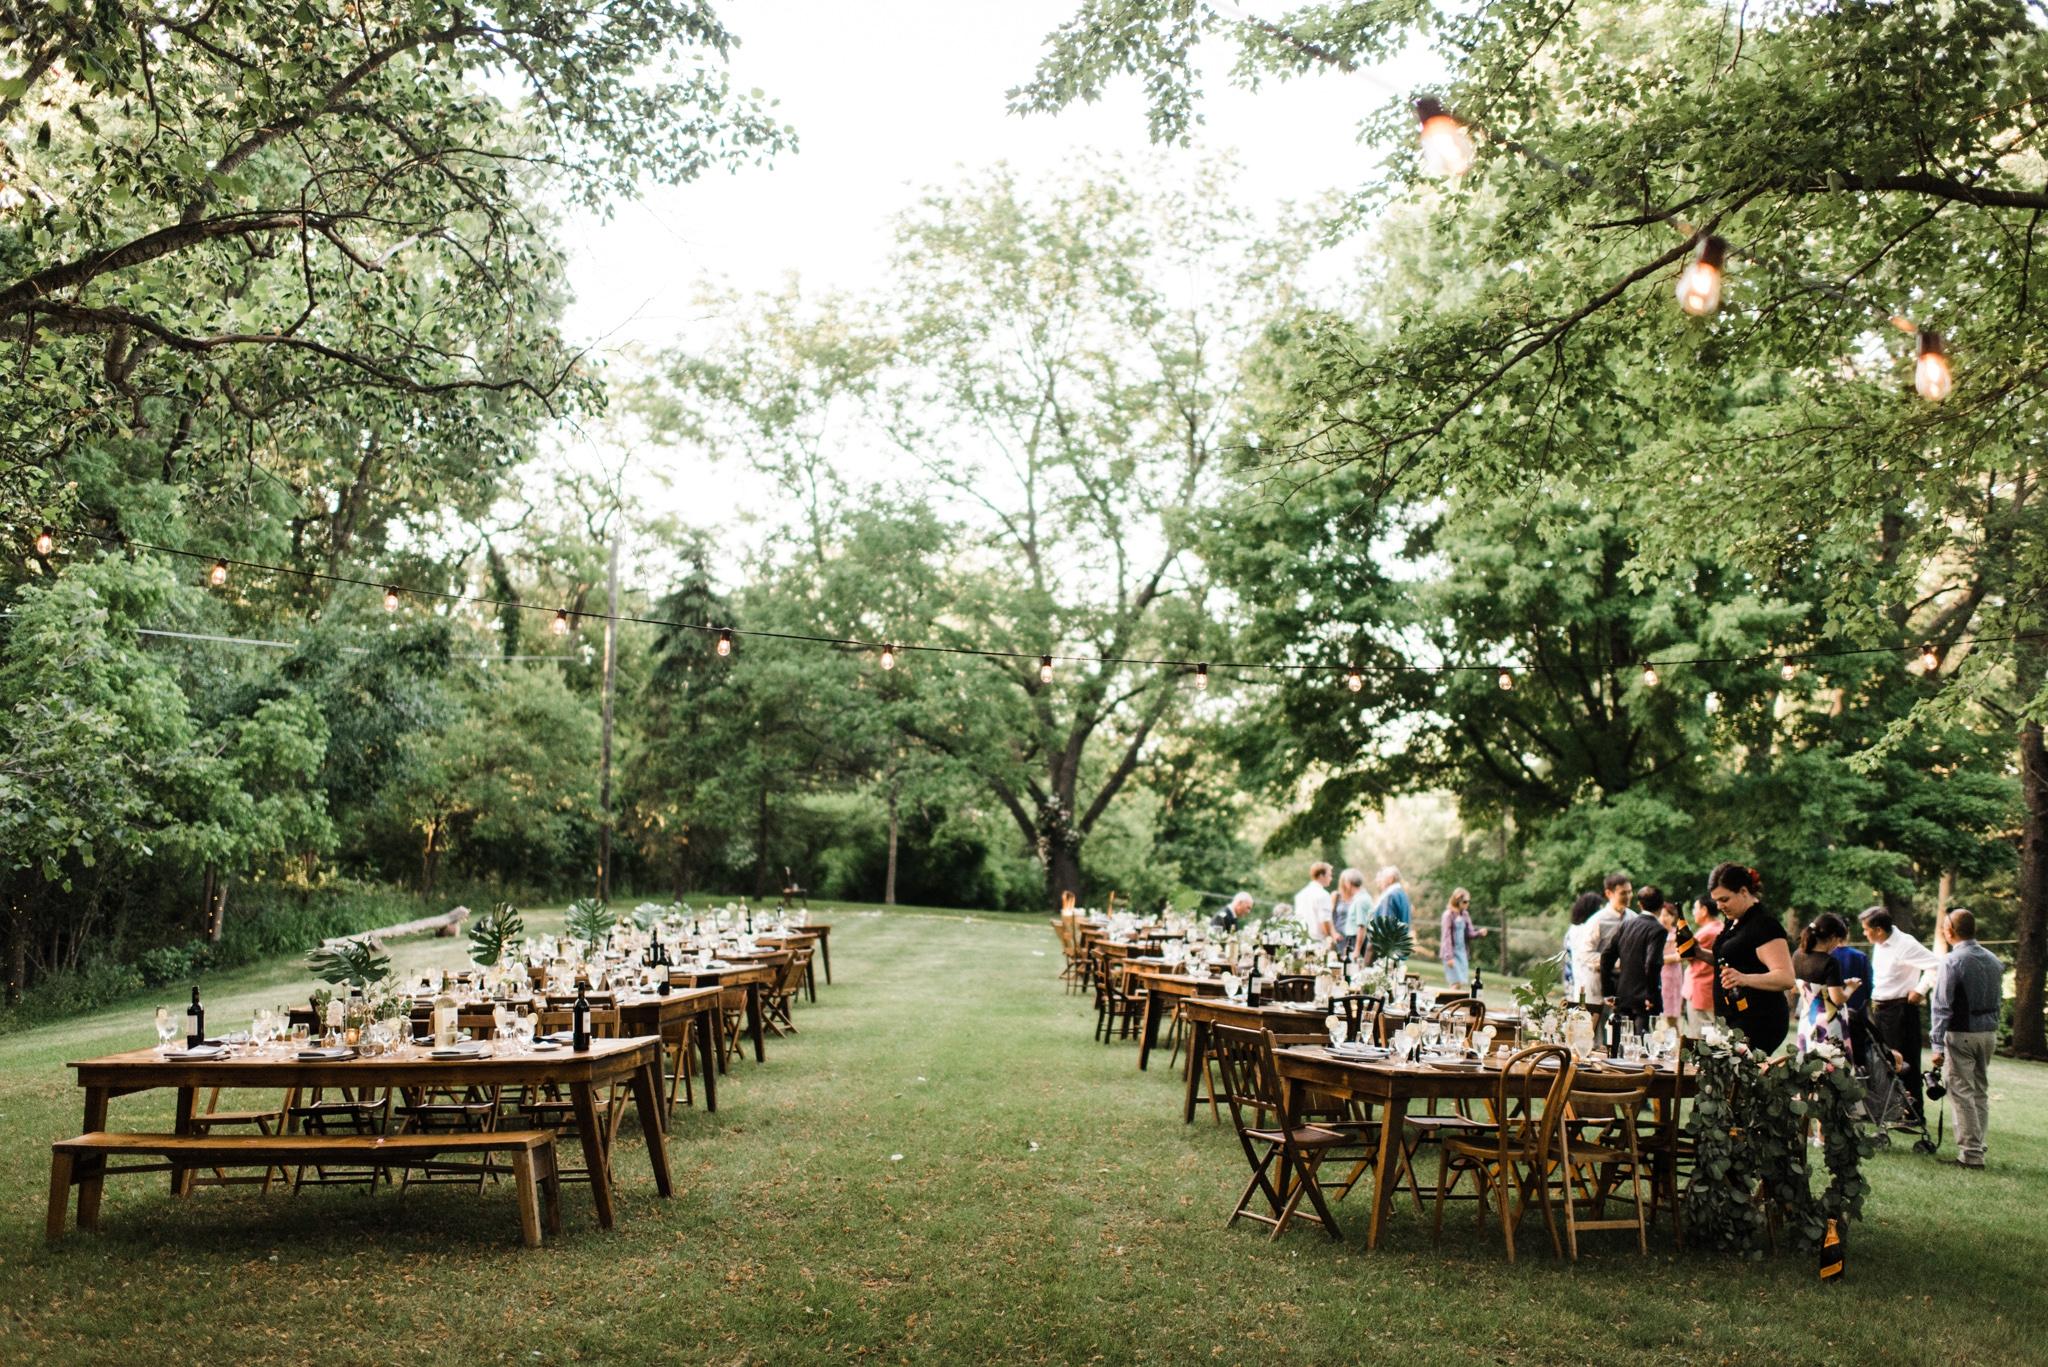 Illinois_backyard_wedding_0023.jpg